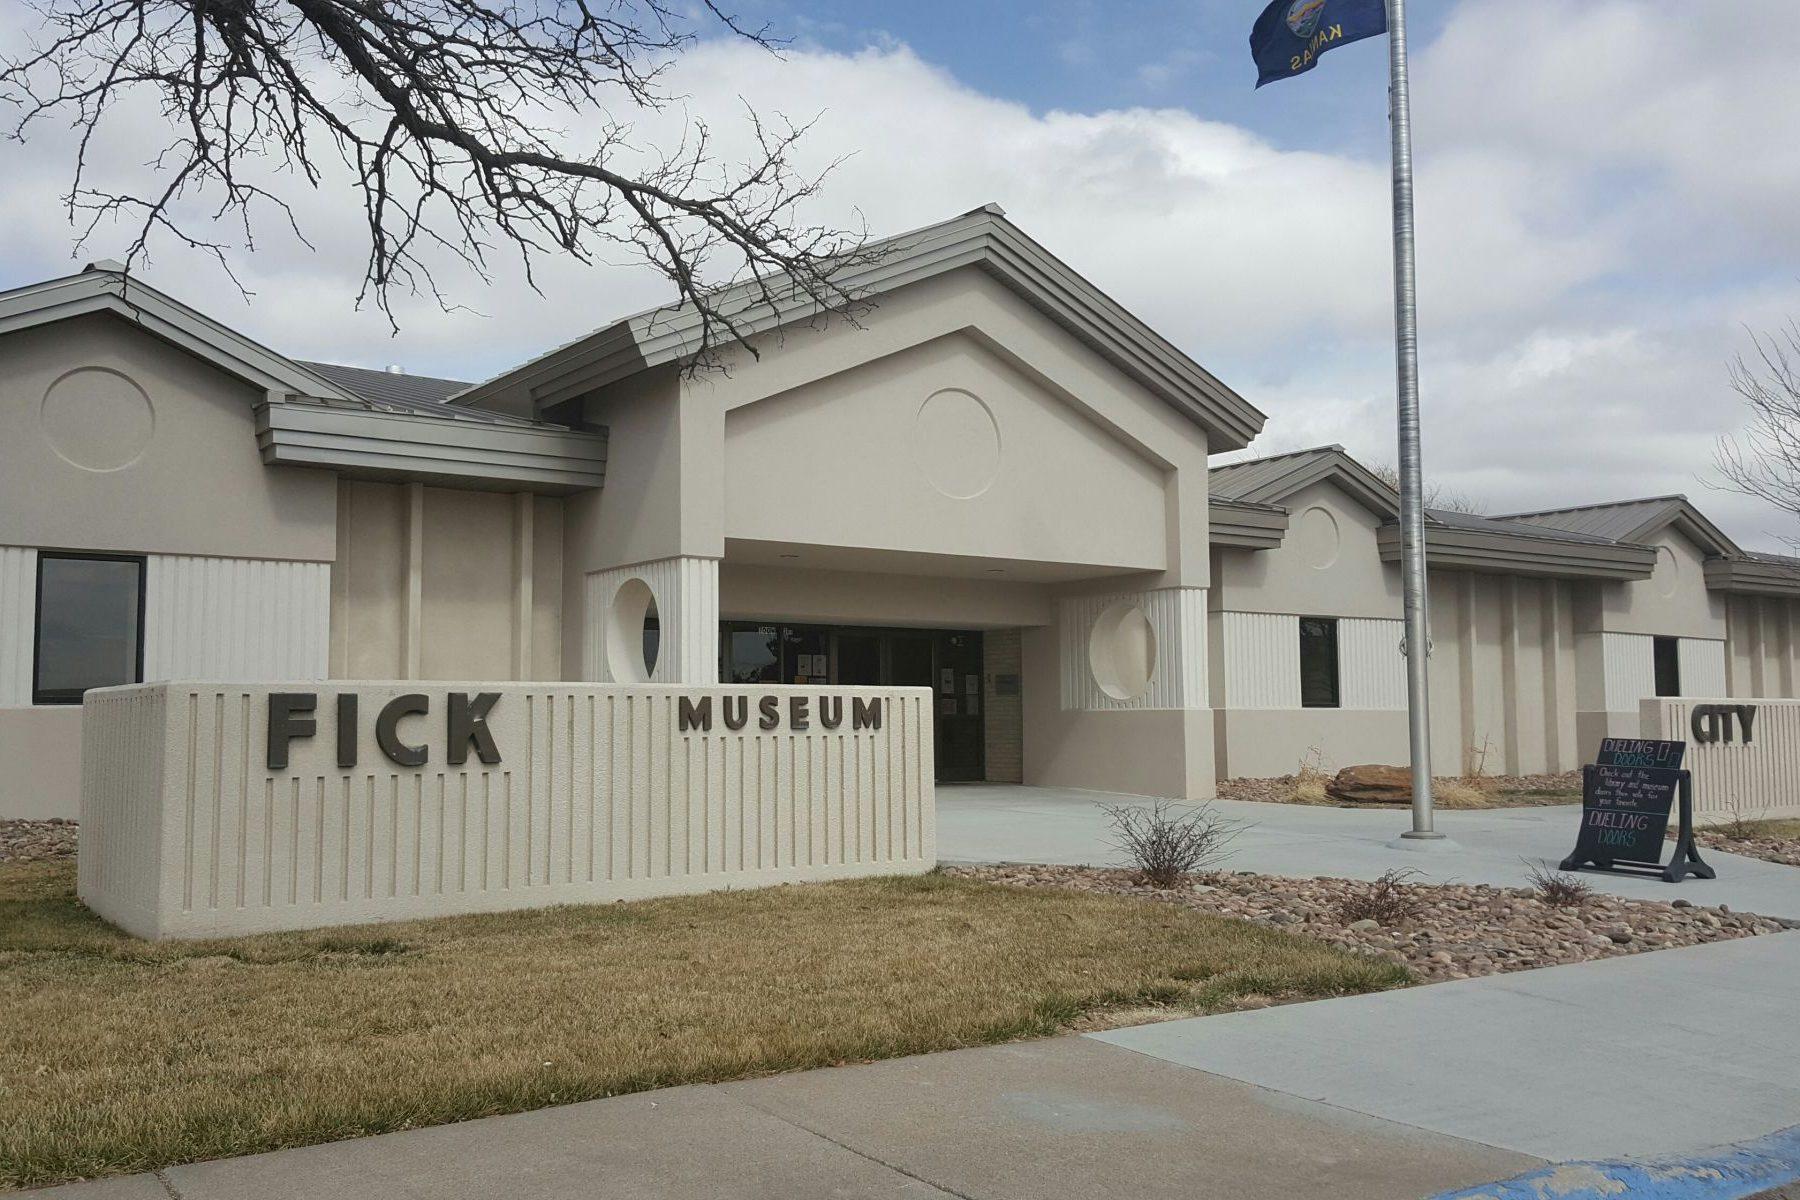 Fick Museum 2